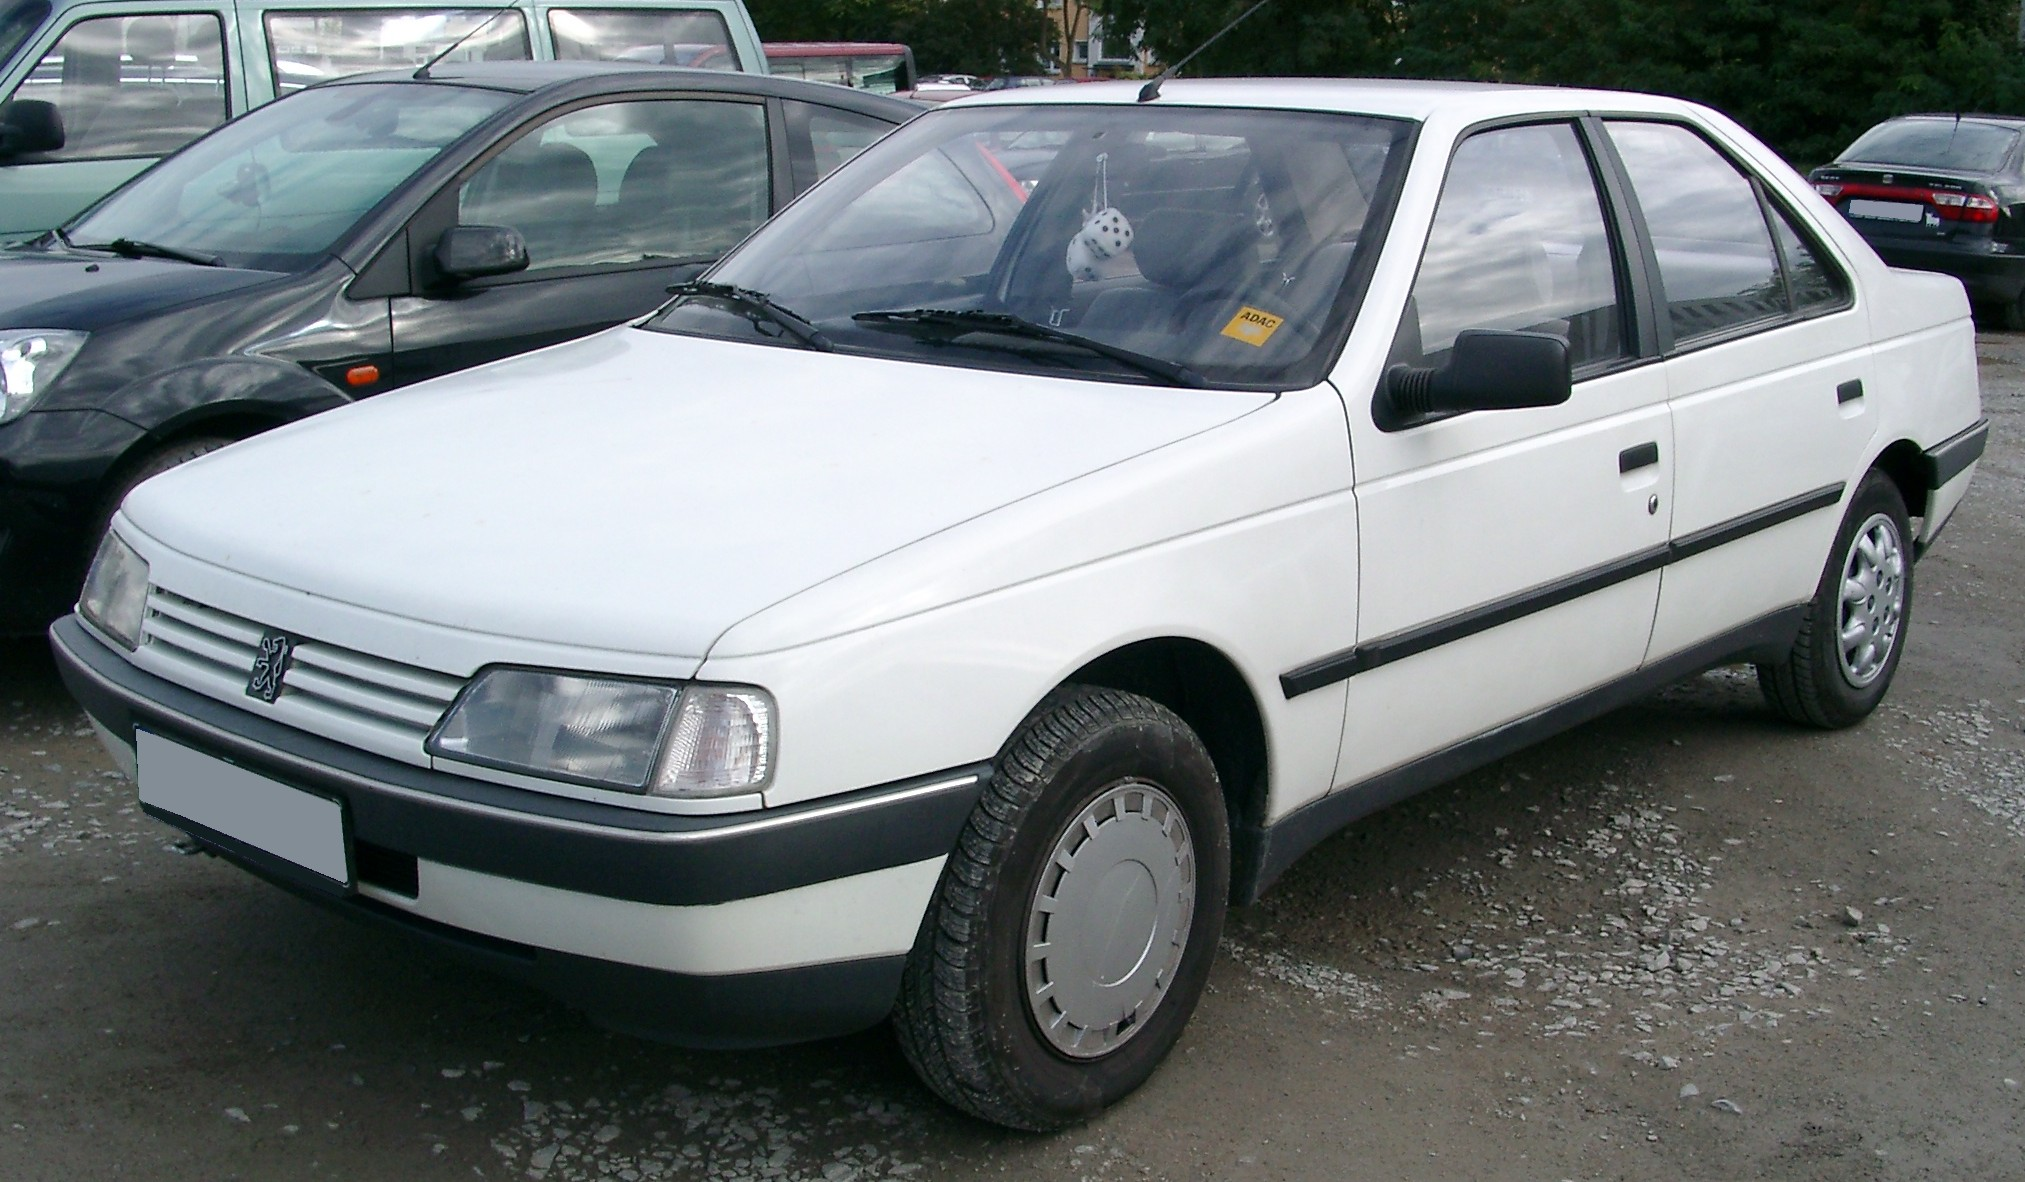 Descripción Peugeot 405 front 20070926.jpg